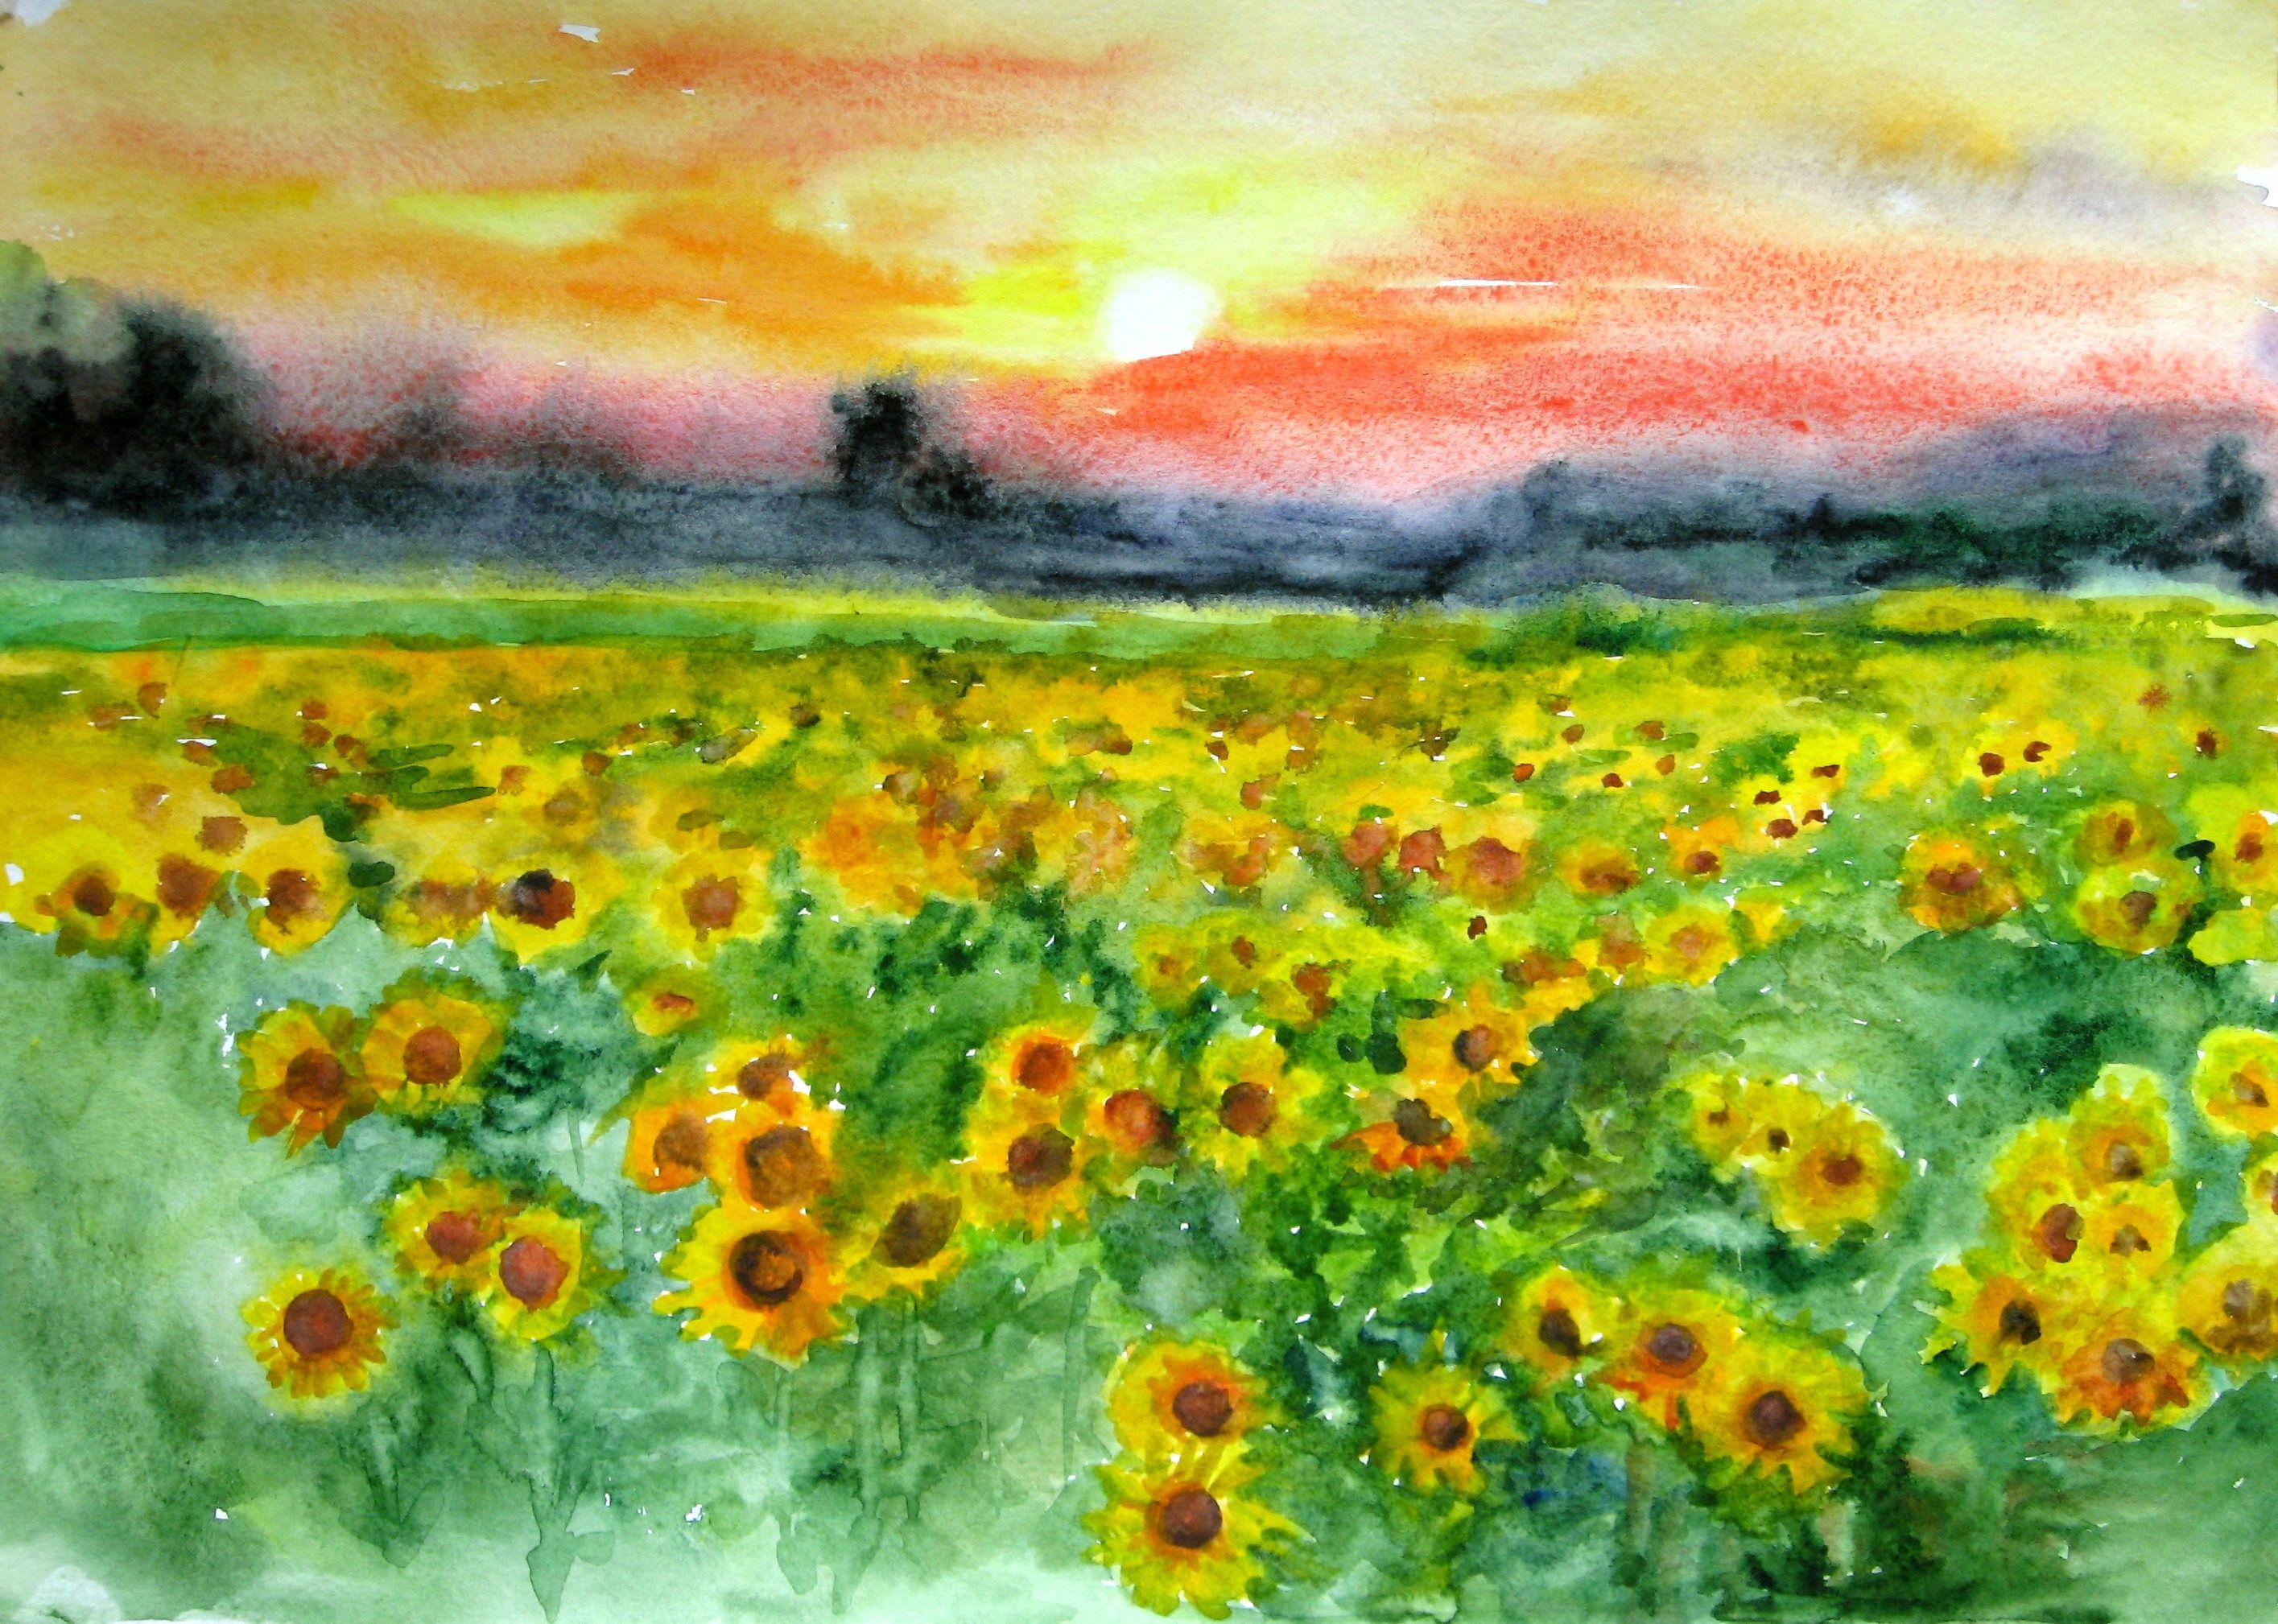 2830x2018 Sunflower Painting Original Landscape Sunflowers Art Original